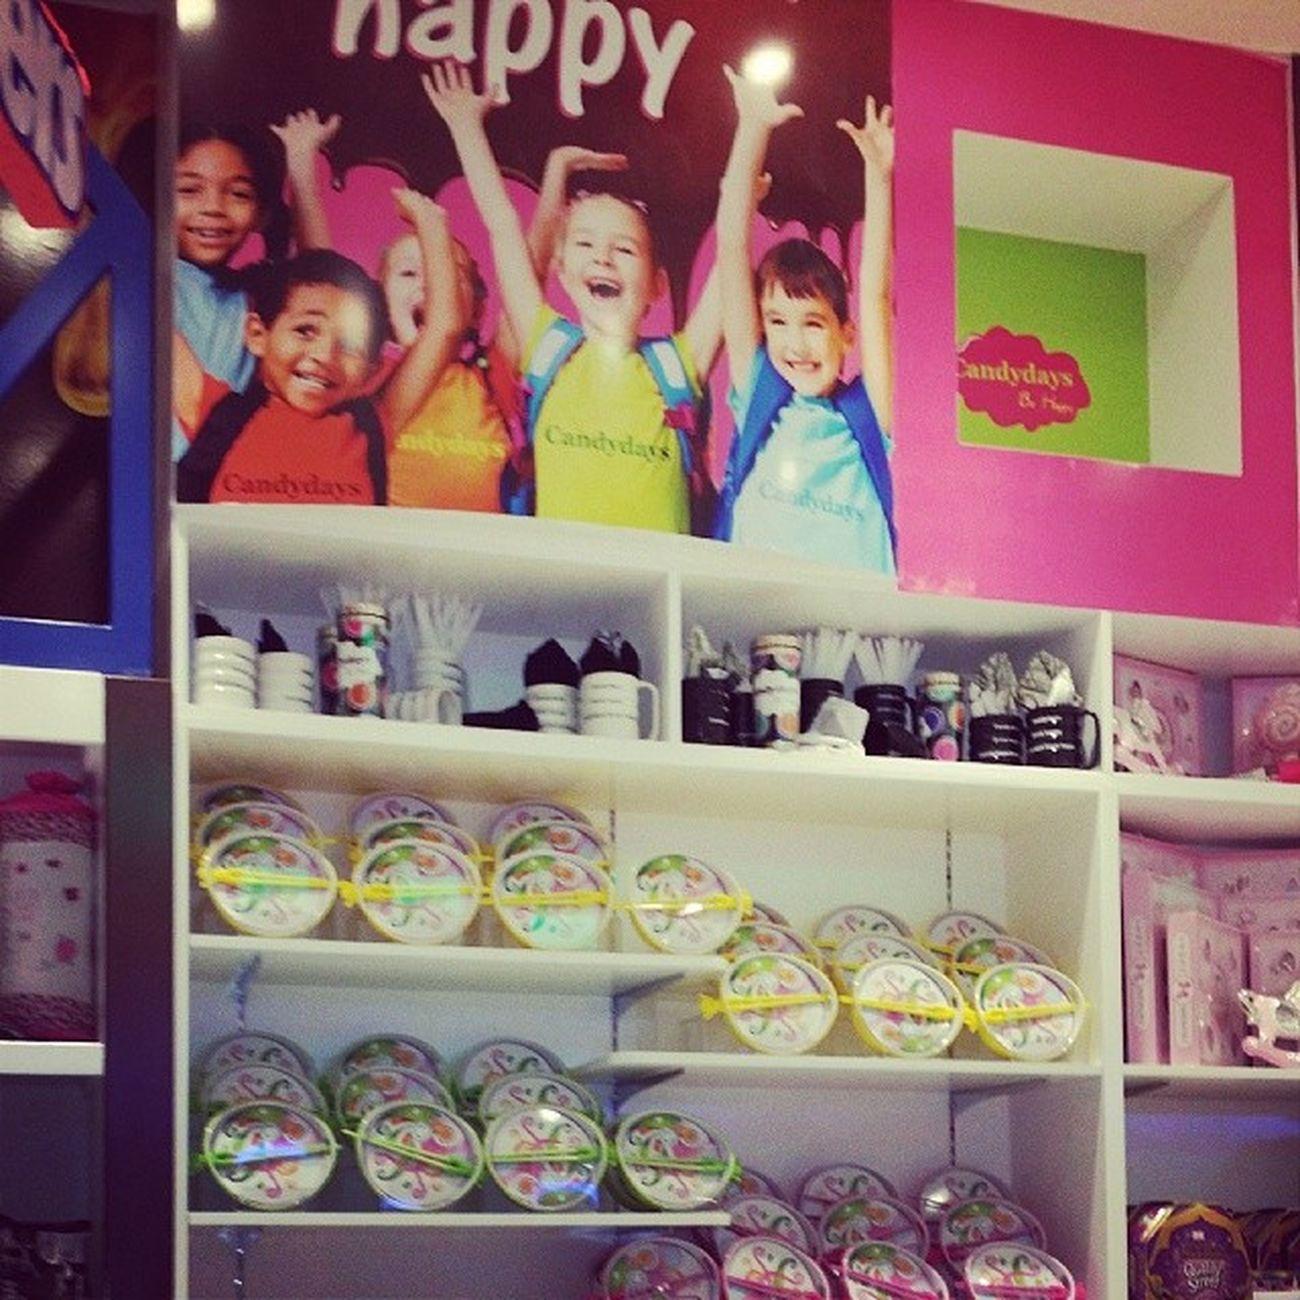 Candydays $_$